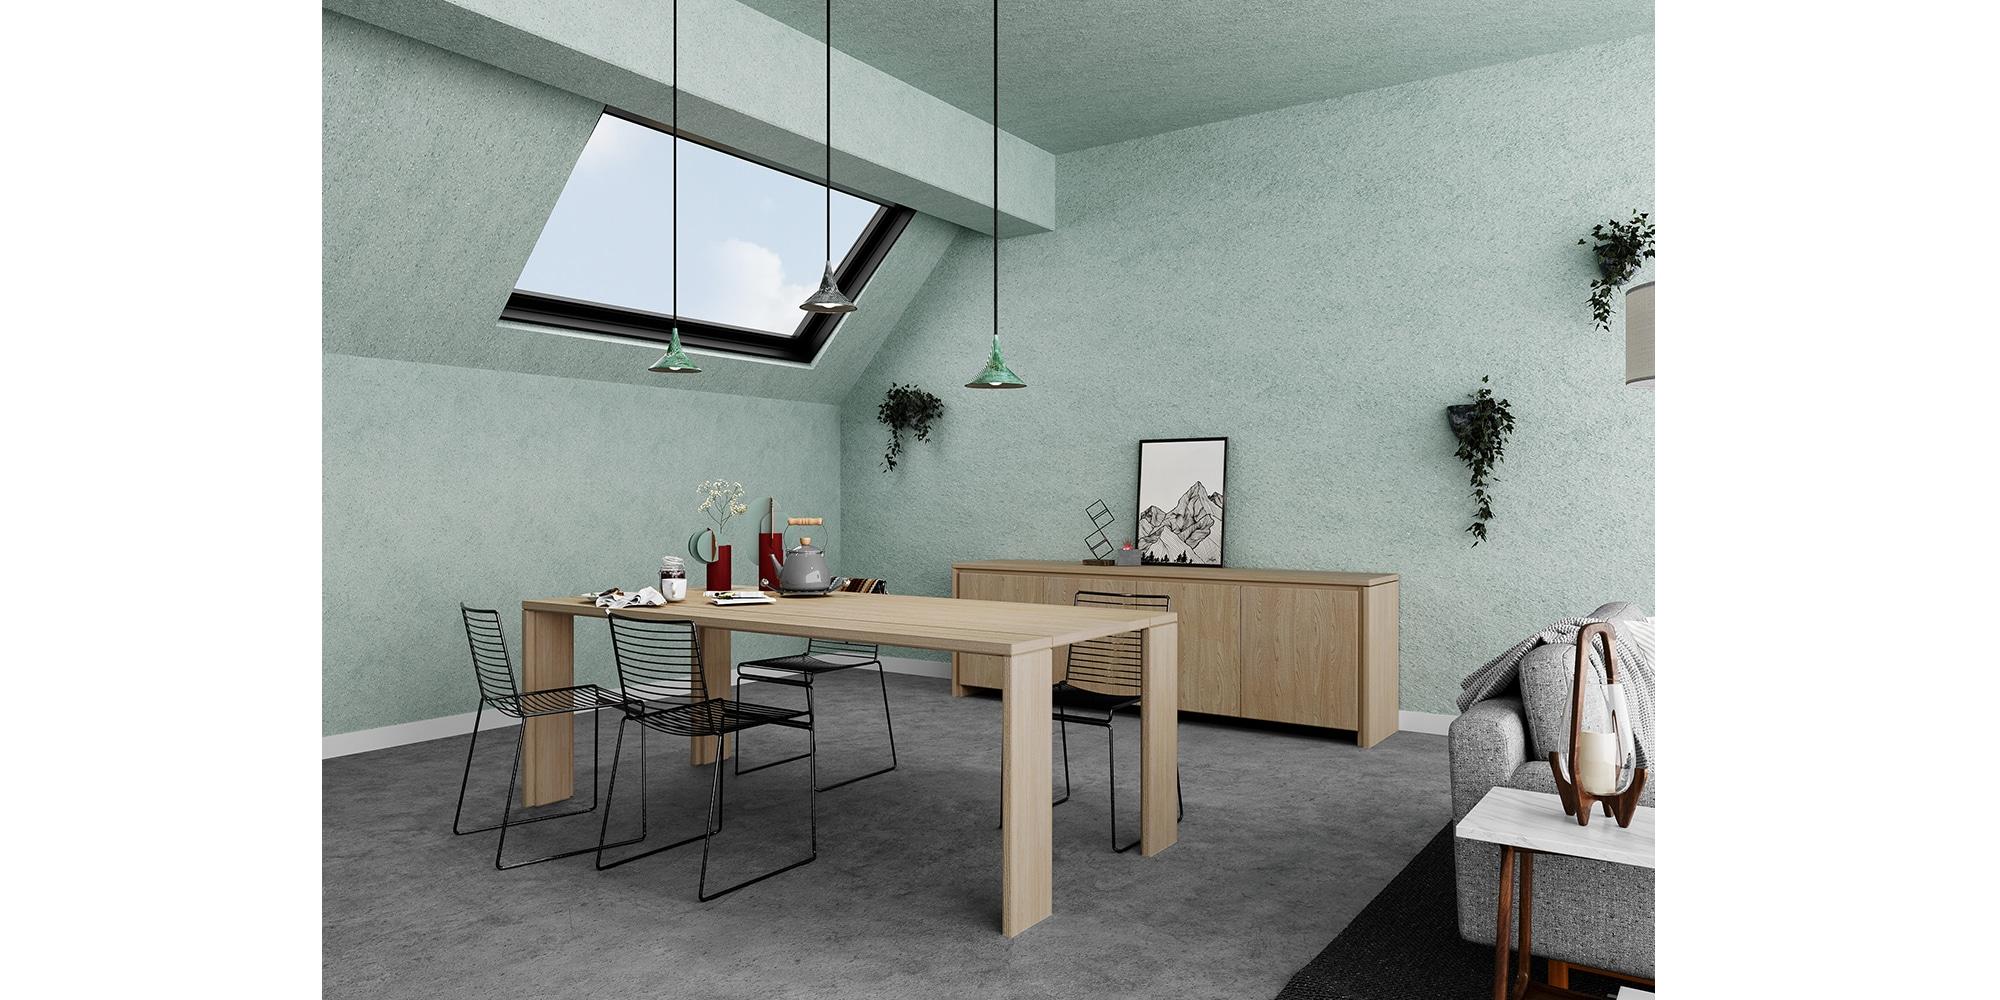 Table en chêne sur mesure design moderne